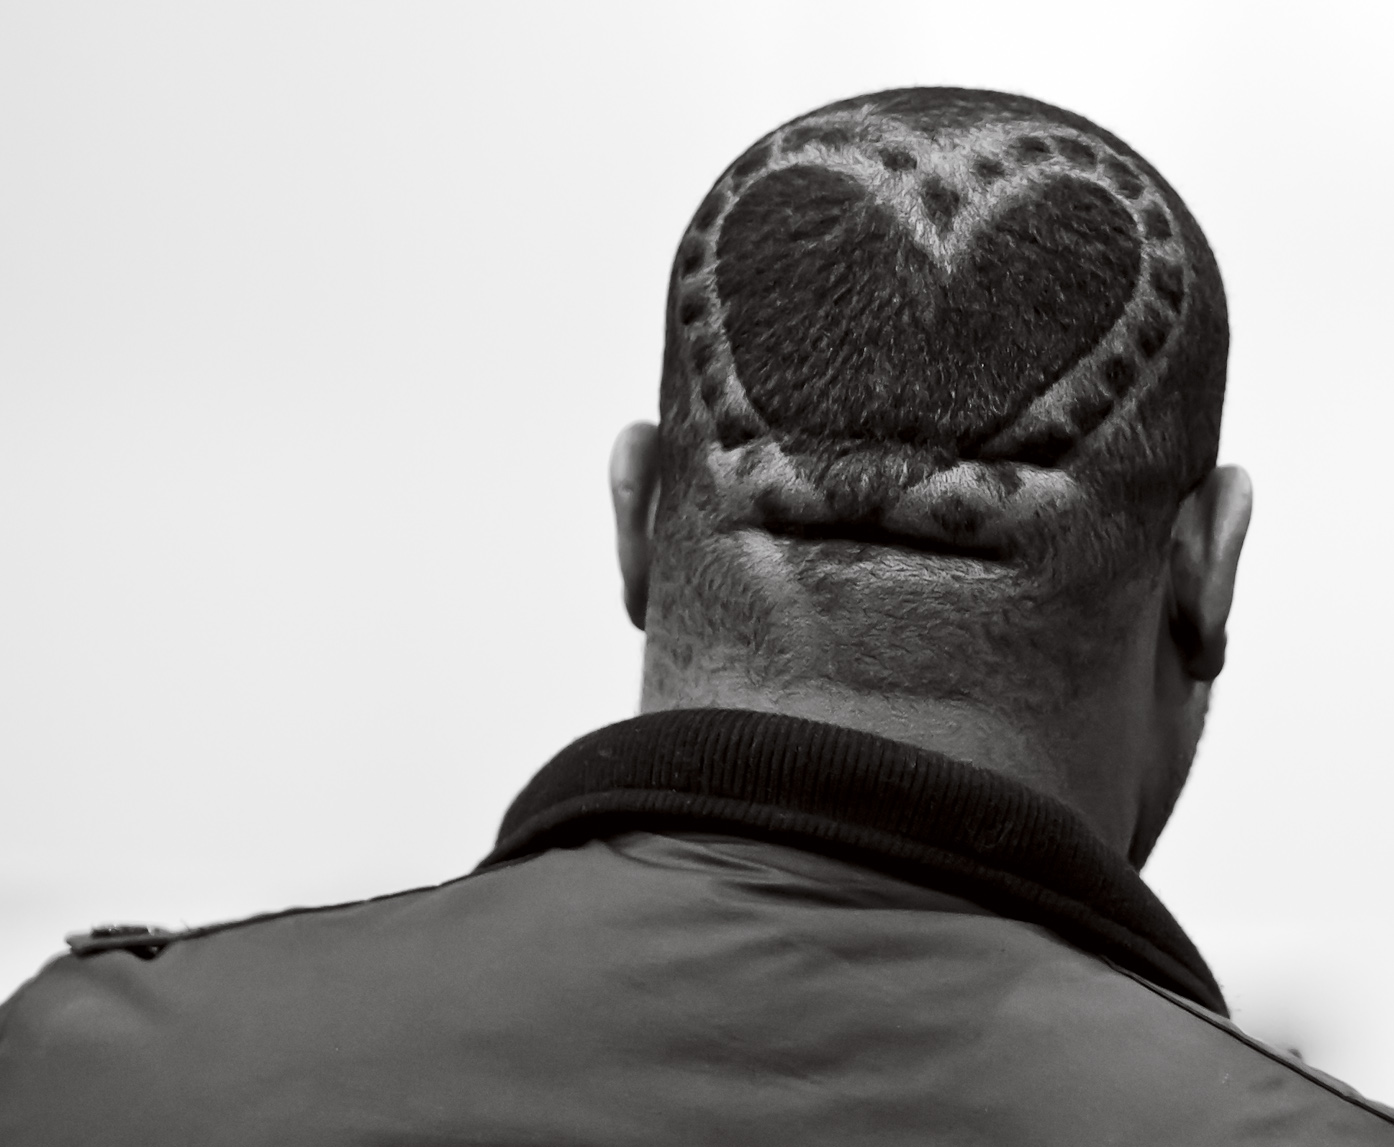 the heart, photo 188056, 2012-01-14